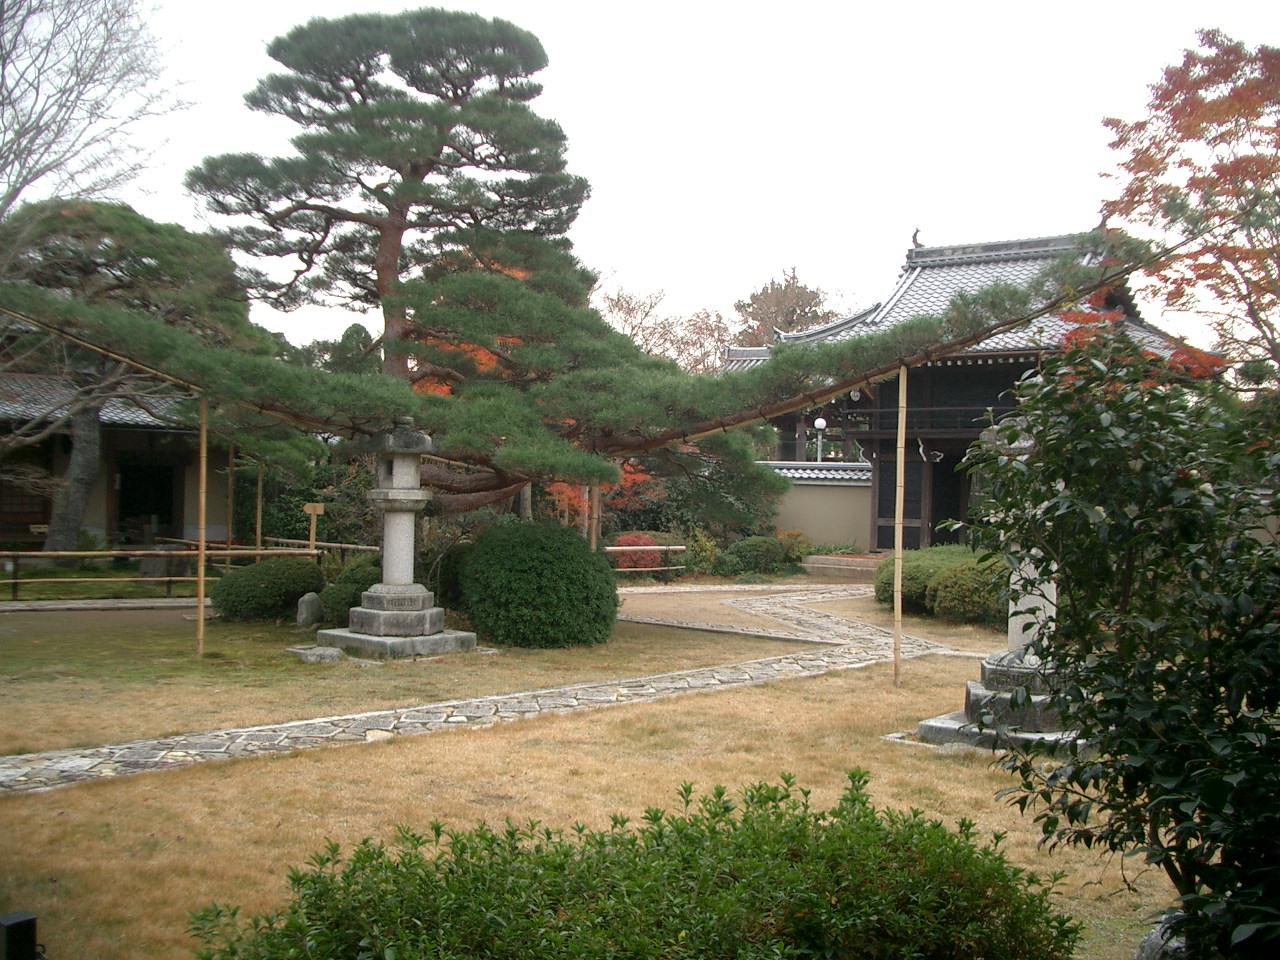 冬の京都_f0147666_18471611.jpg